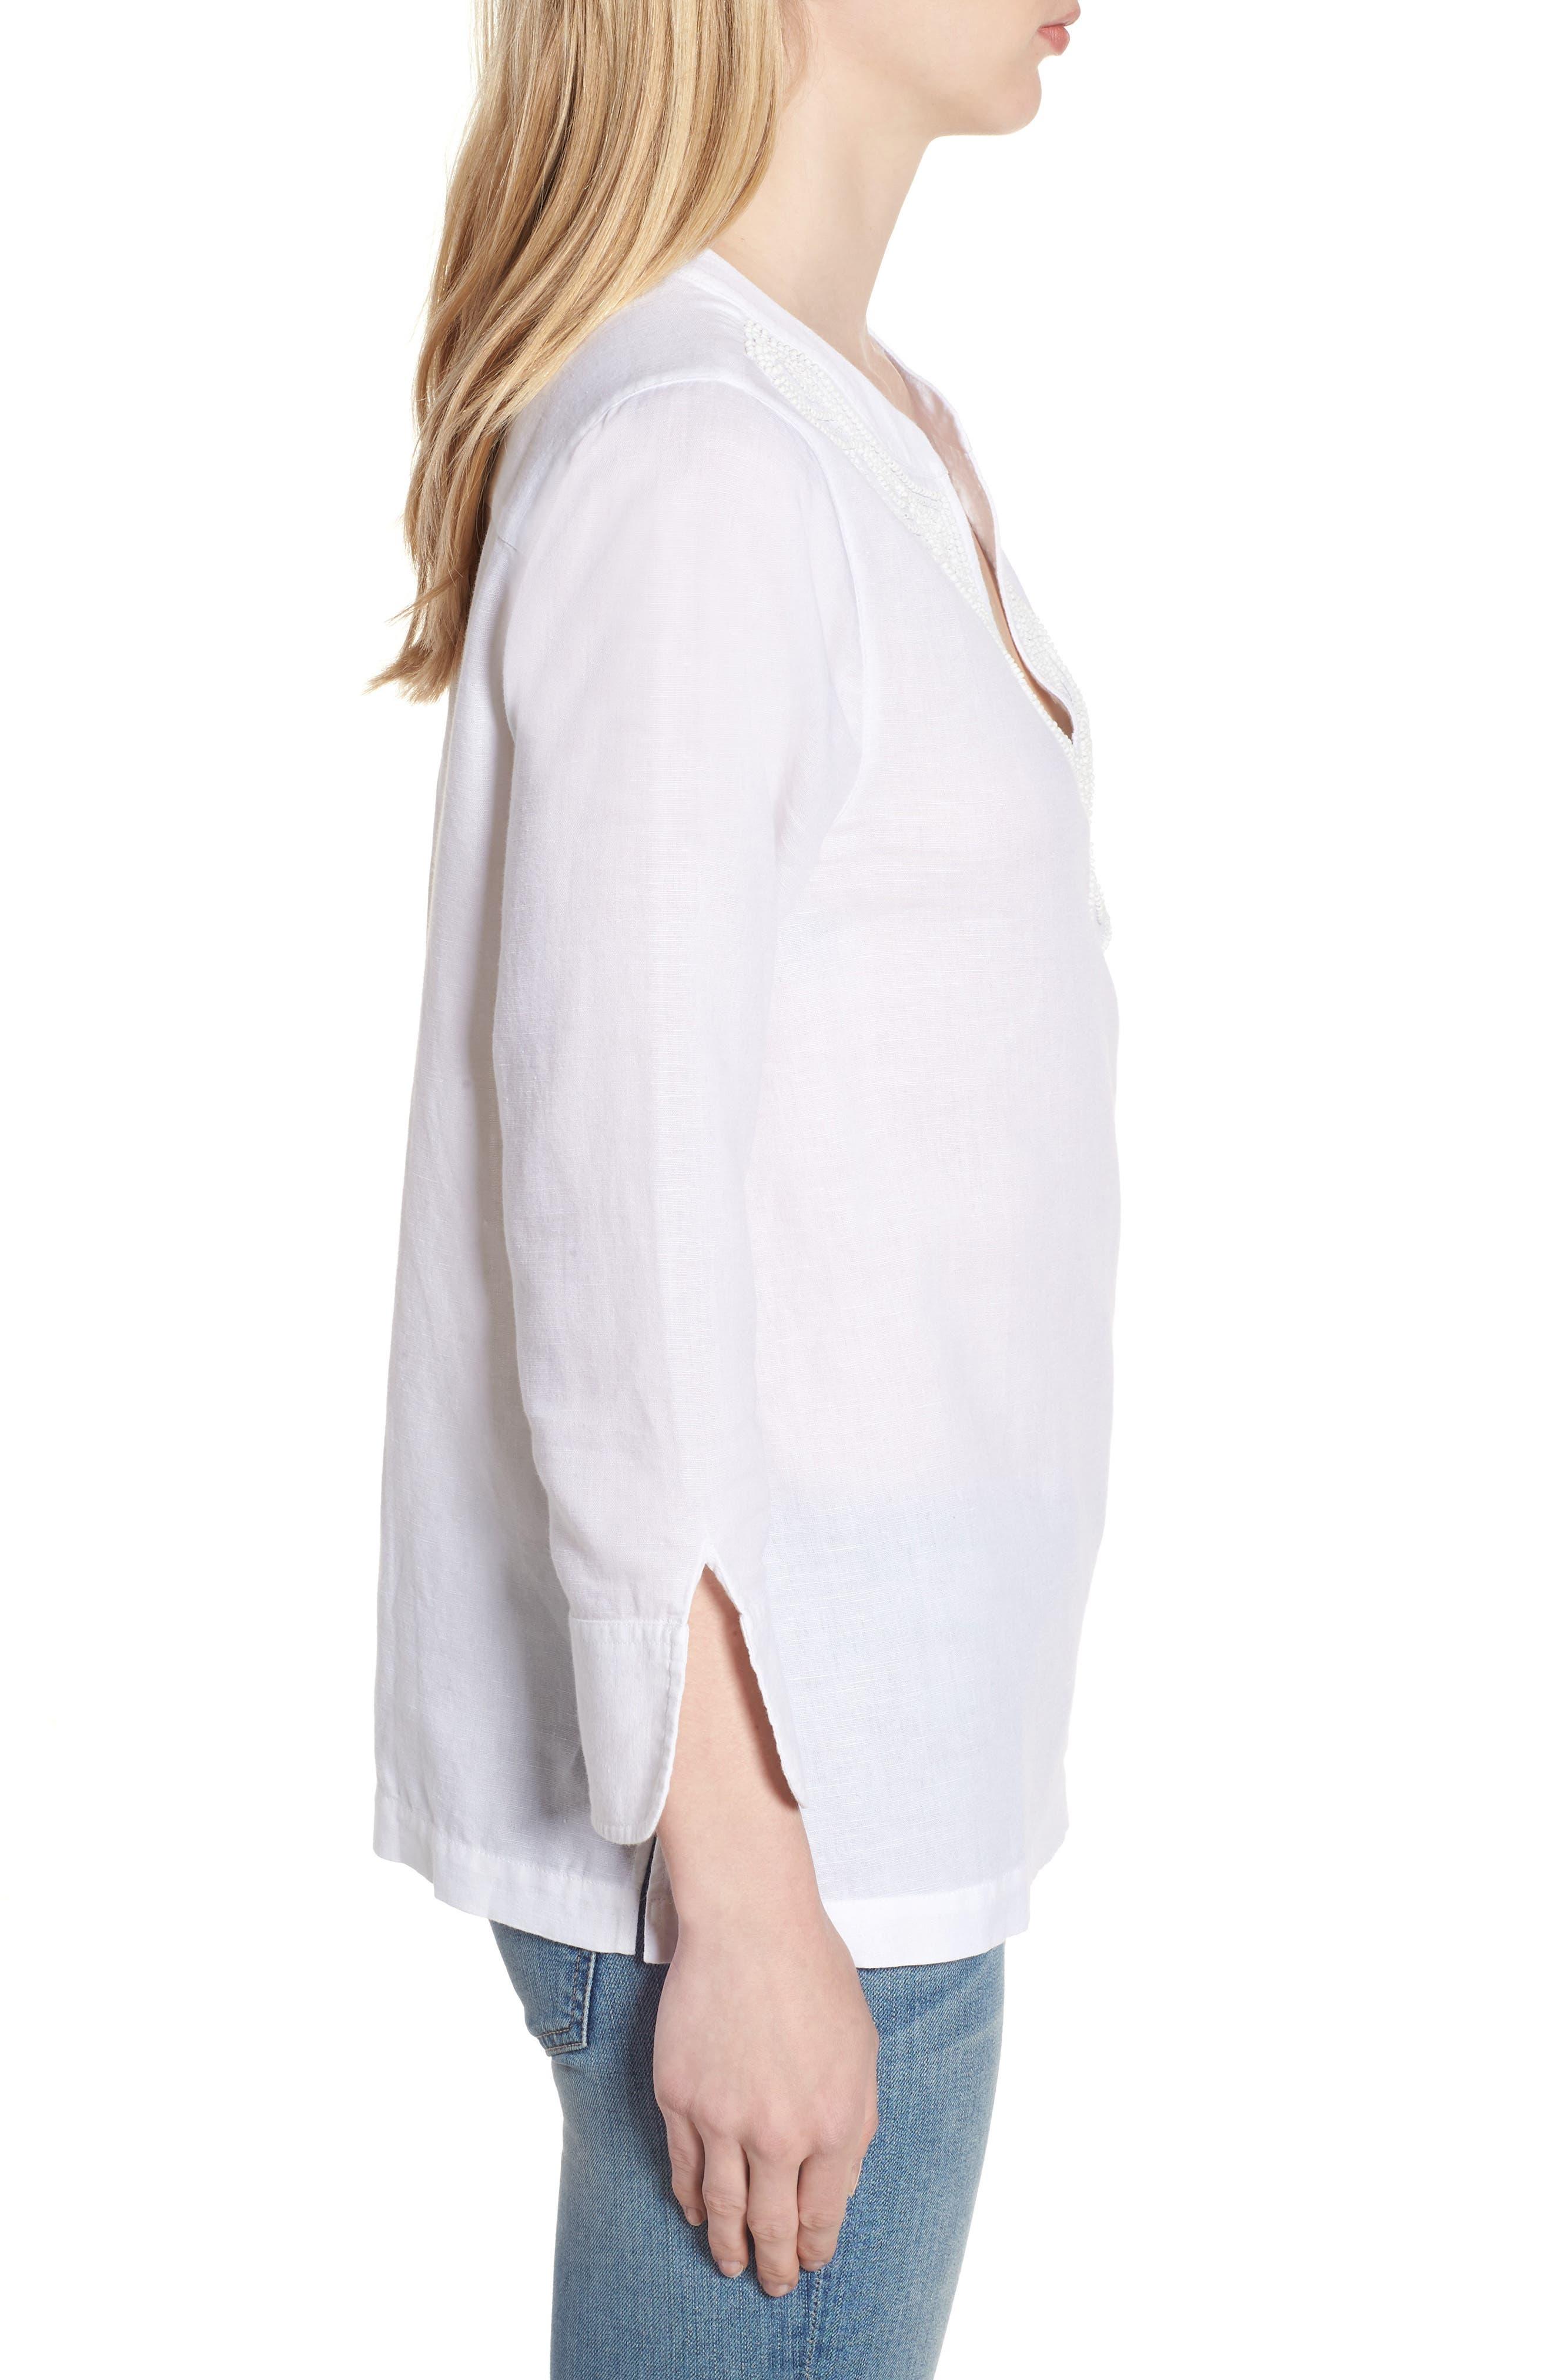 Embellished Tunic Top,                             Alternate thumbnail 3, color,                             White Cap